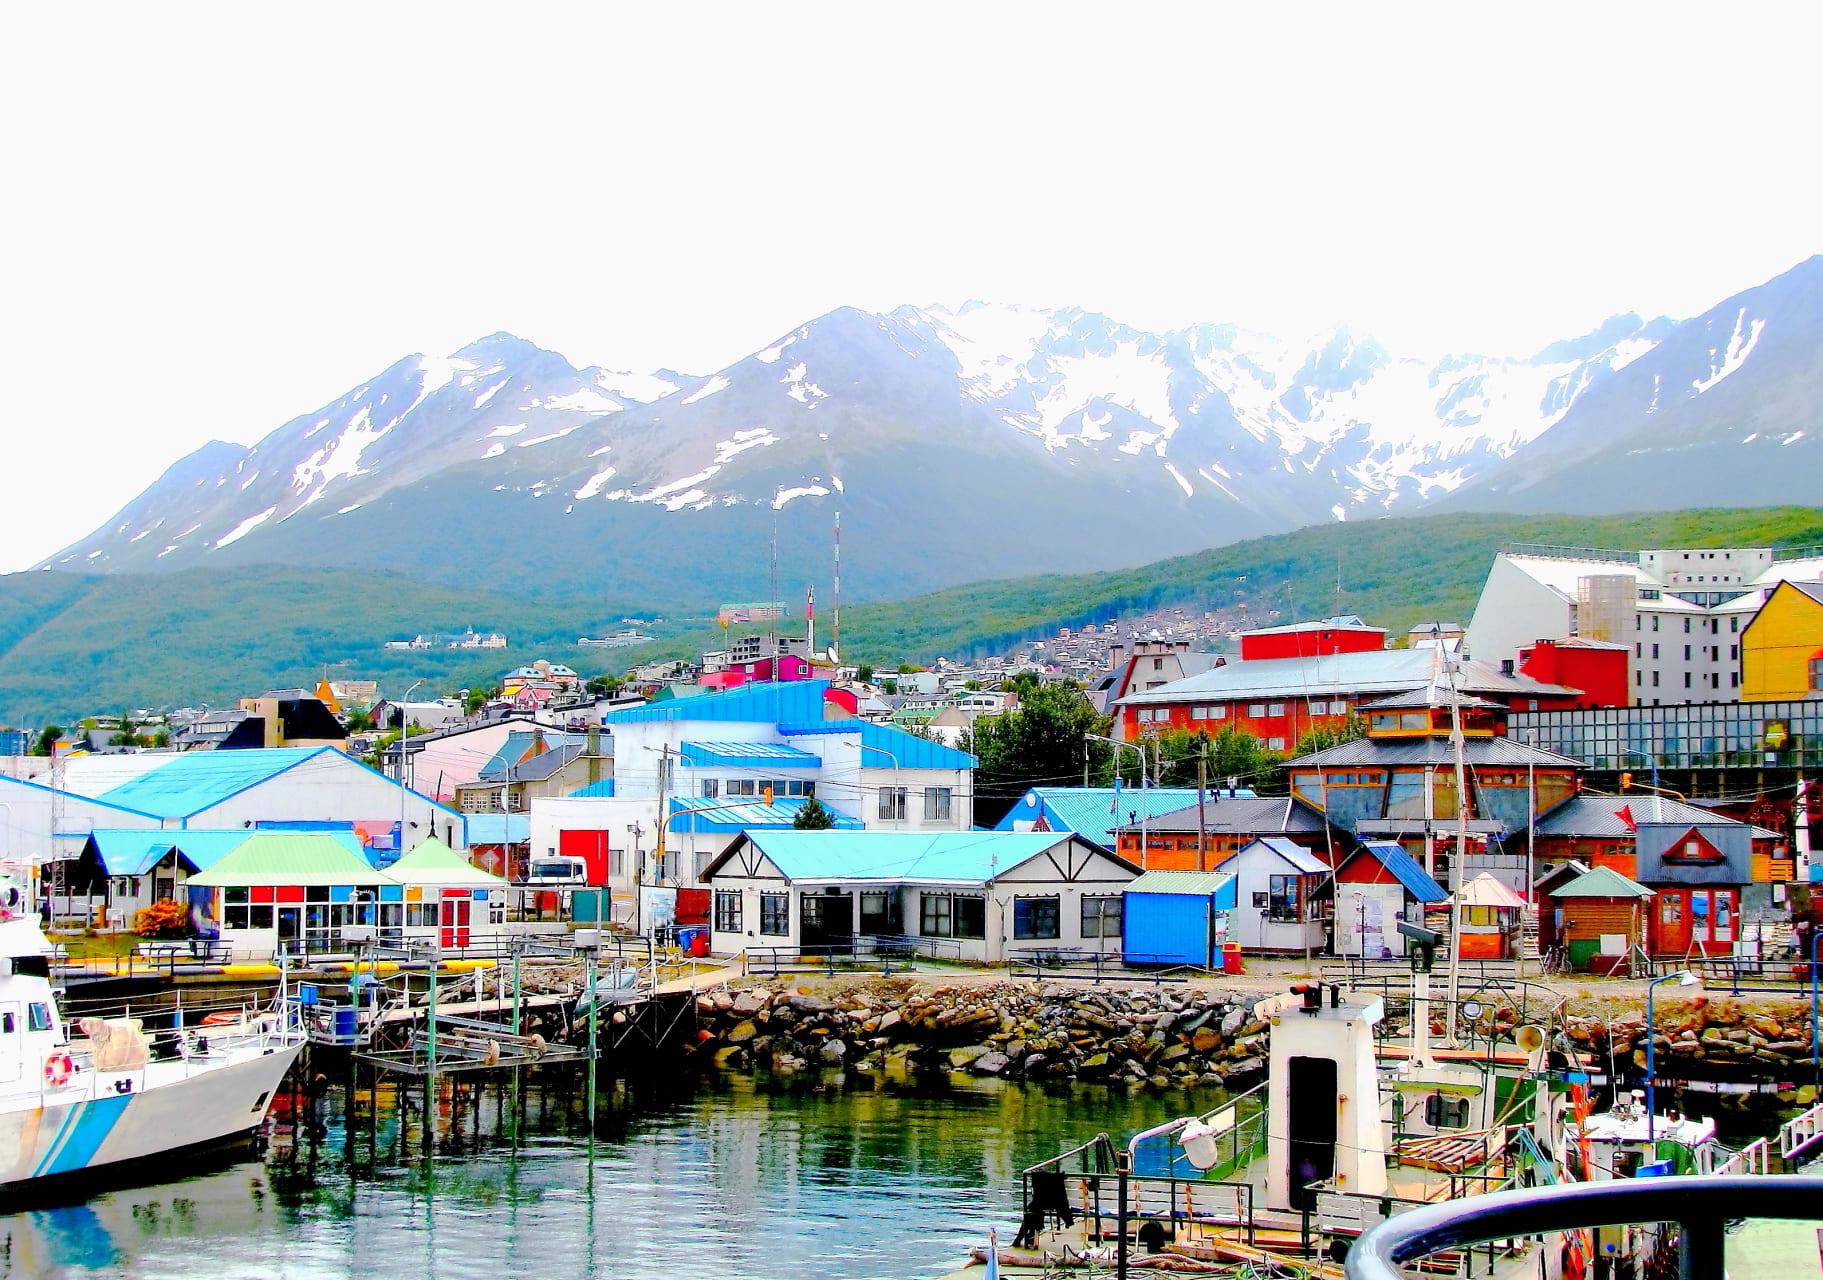 Ushuaia - Ushuaia: Exploring the End of the World